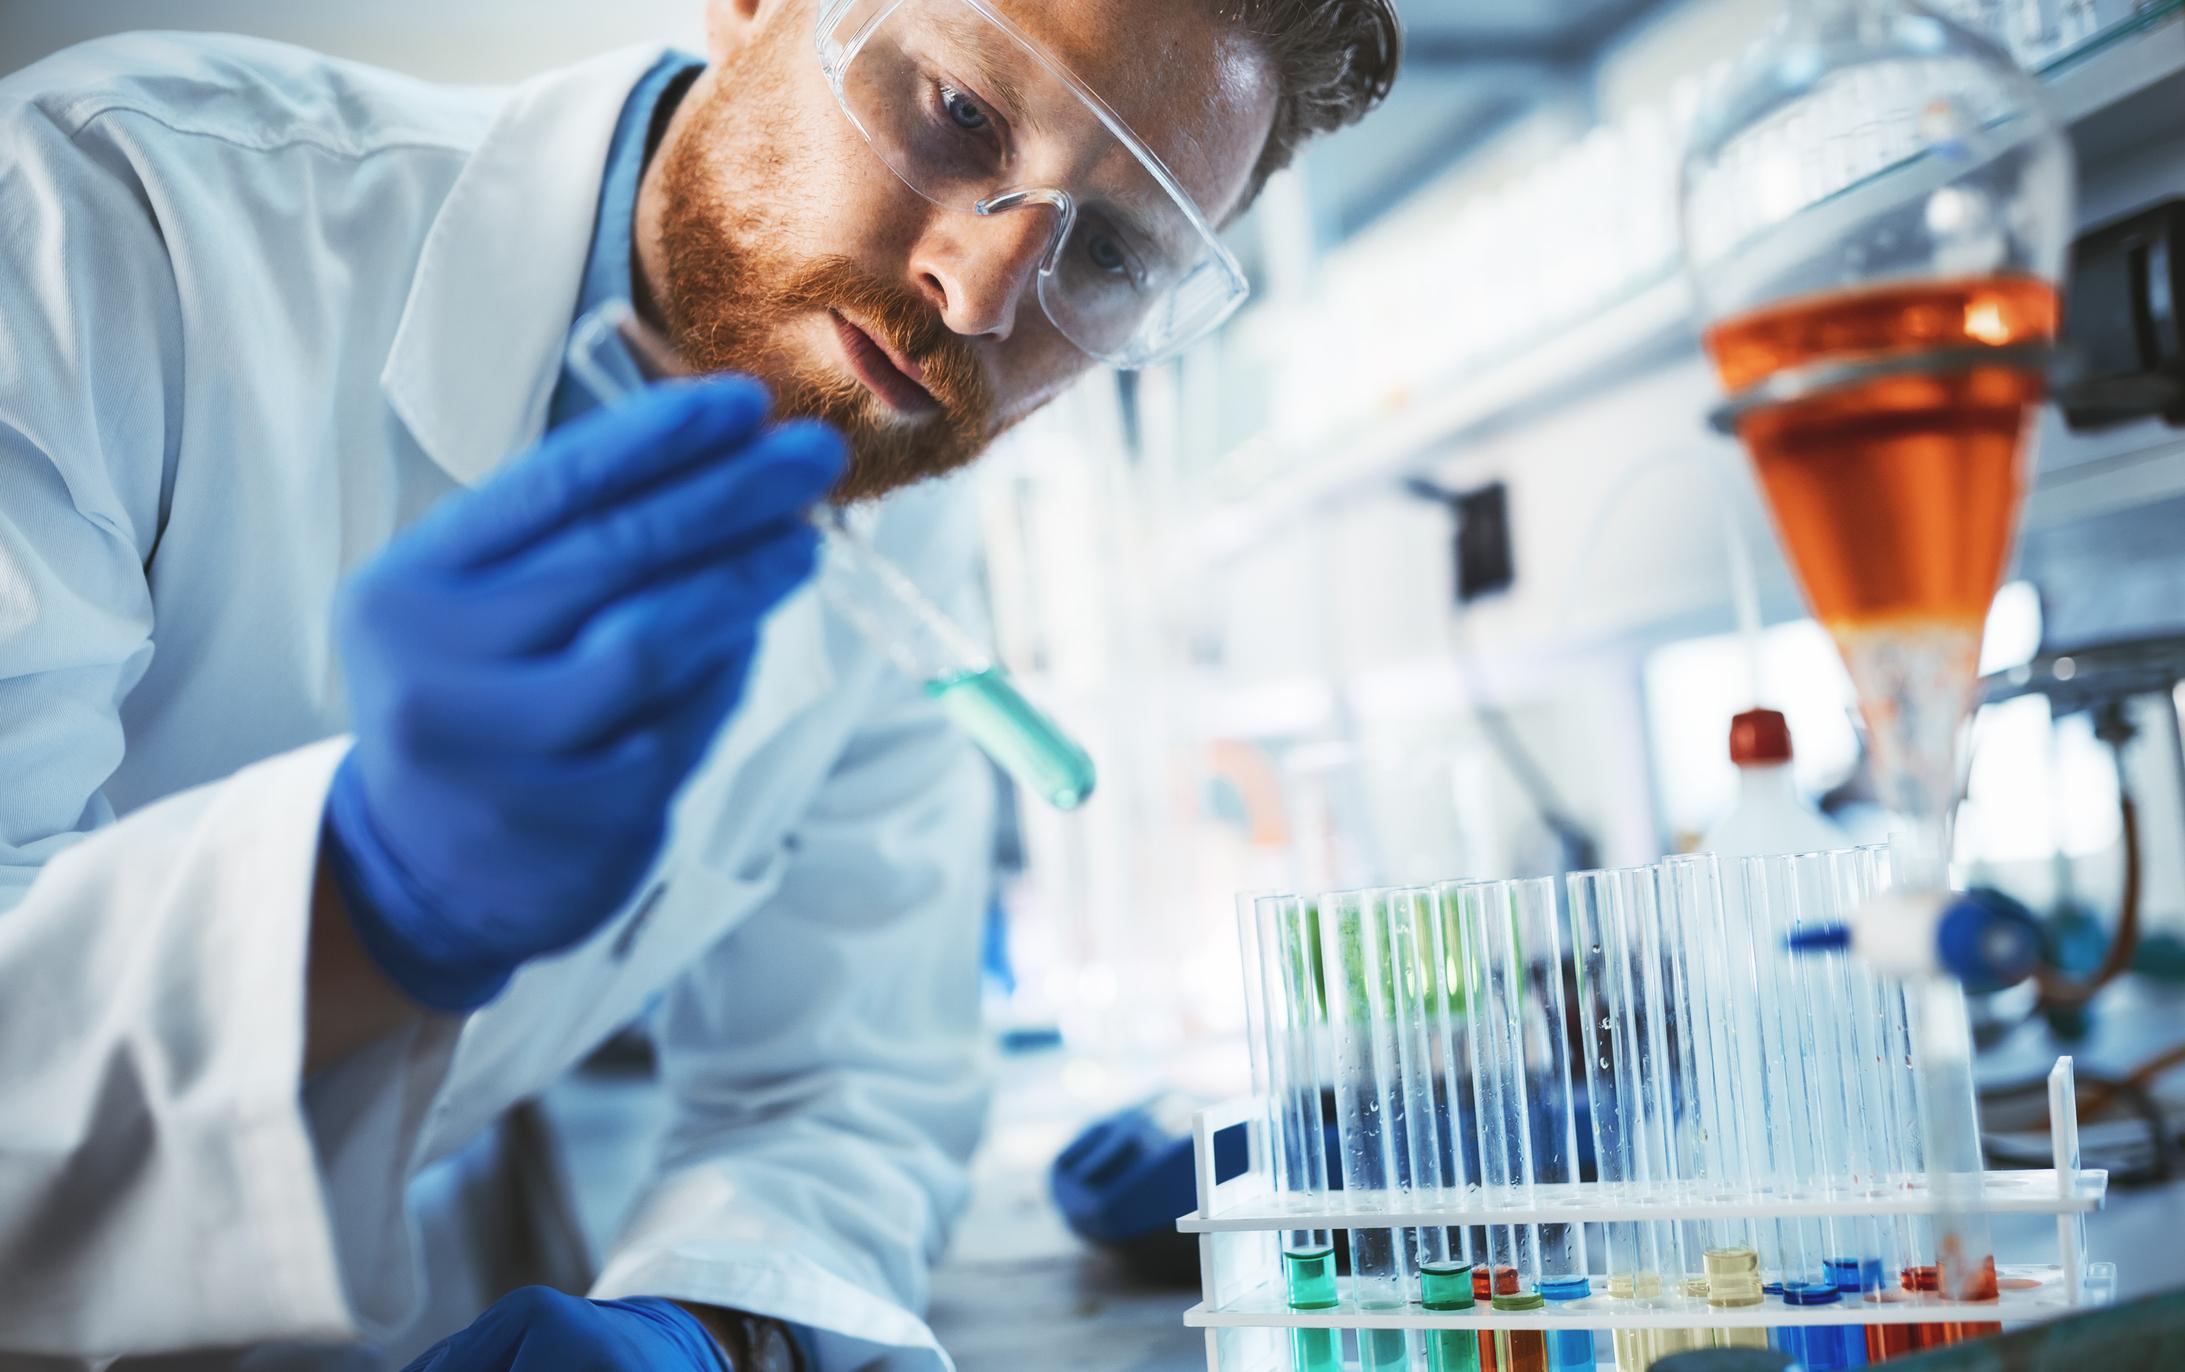 Scientist holding vial in lab